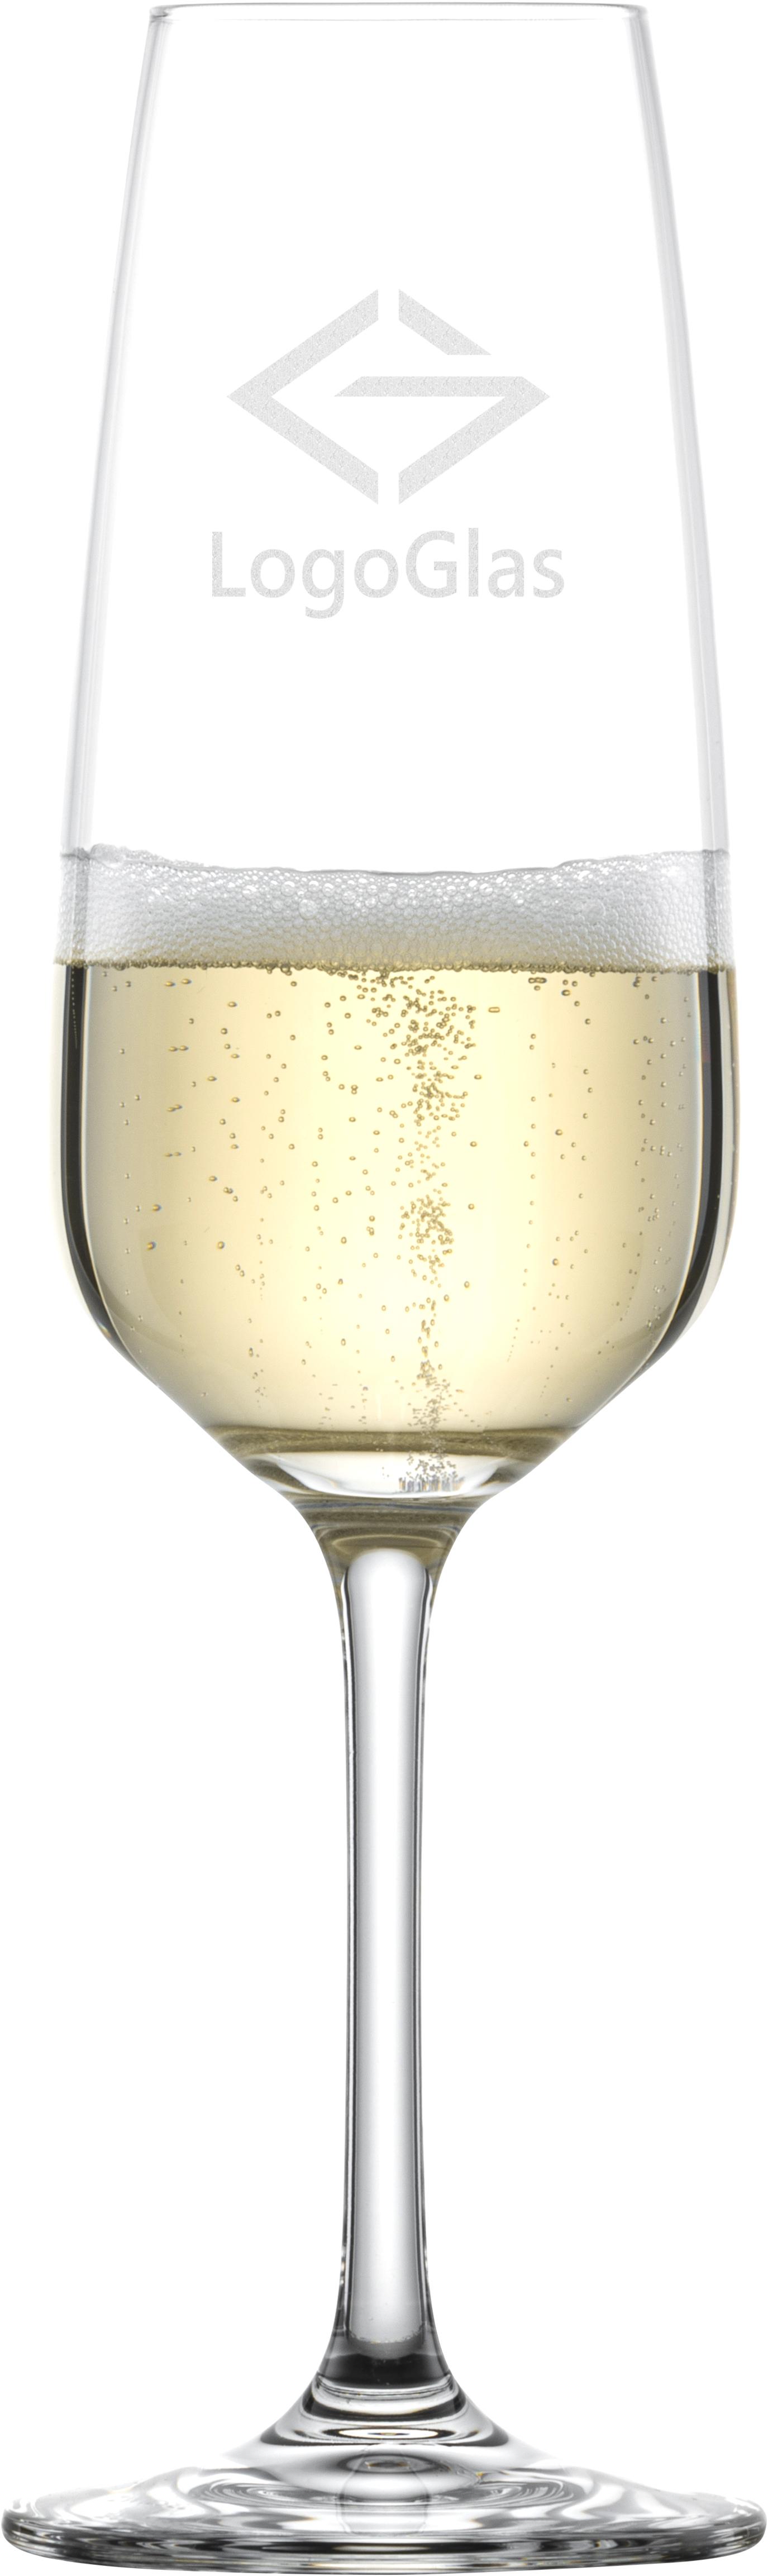 LOGO SCHOTT Sektglas TASTE 283ml | Champagnerflöte | mit Logo